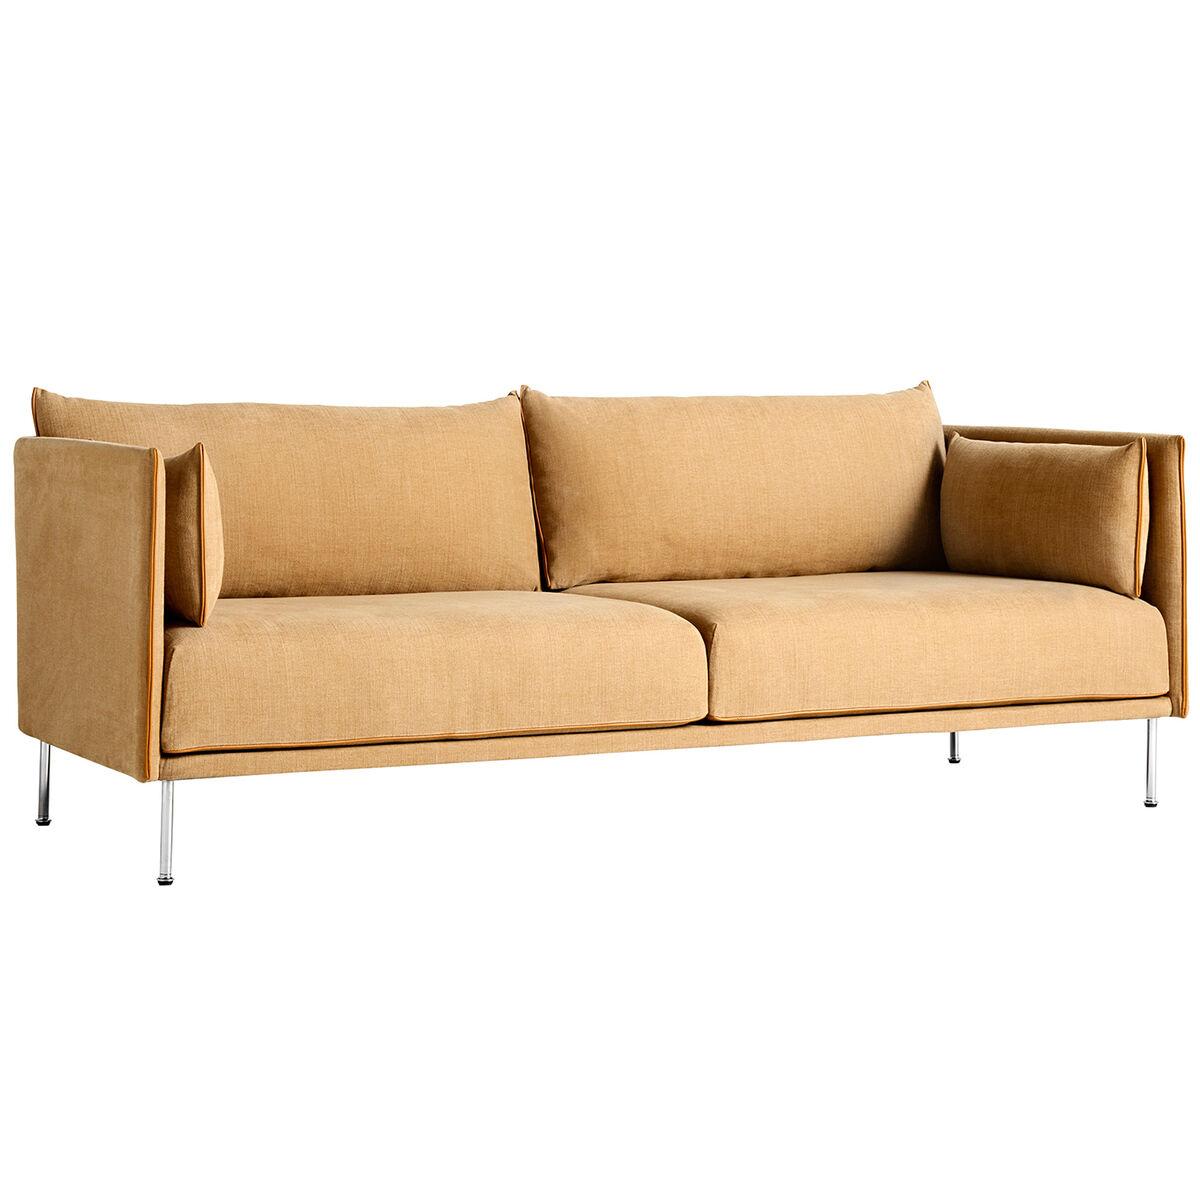 Hay Silhouette sohva 3-ist, Linara 142/Silk cognac - kromi